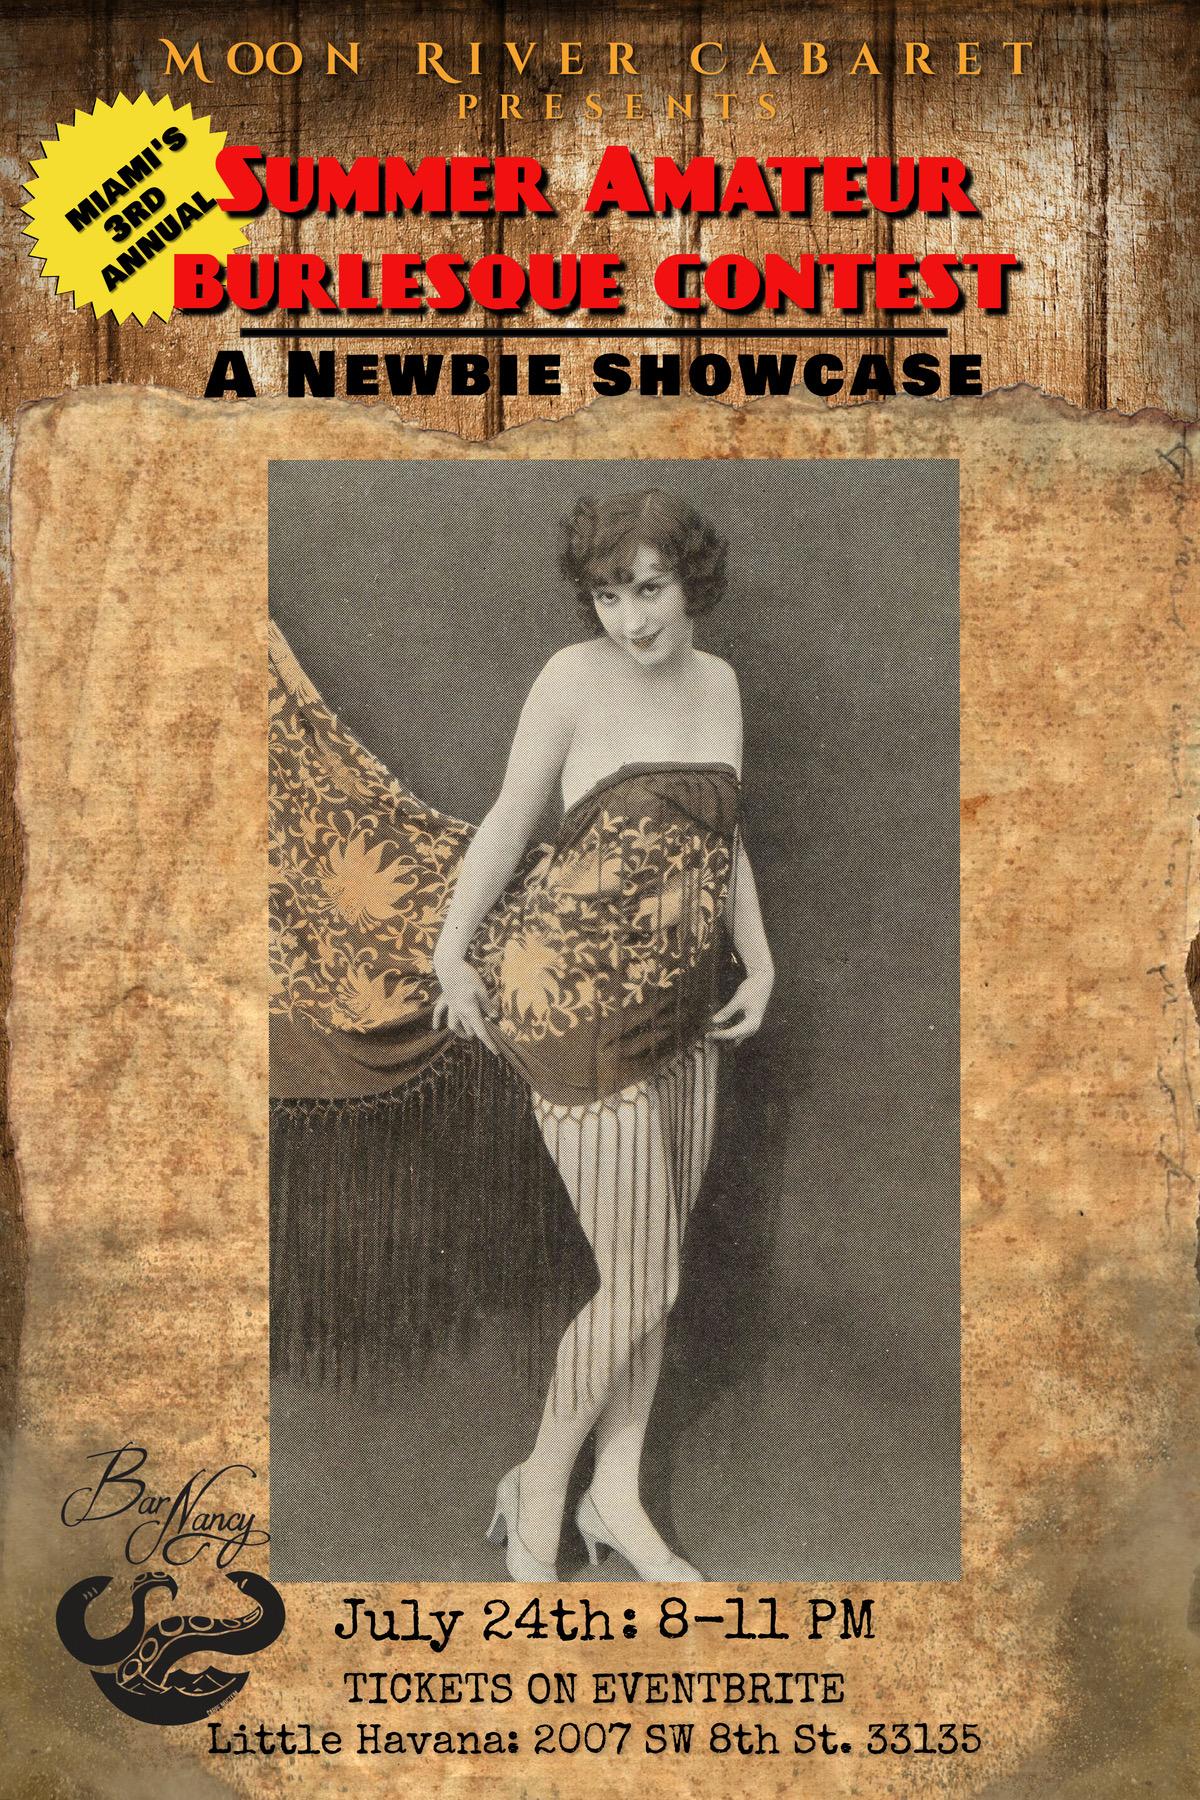 Summer Amateur Barlesque Contest at Bar Nancy - July 24